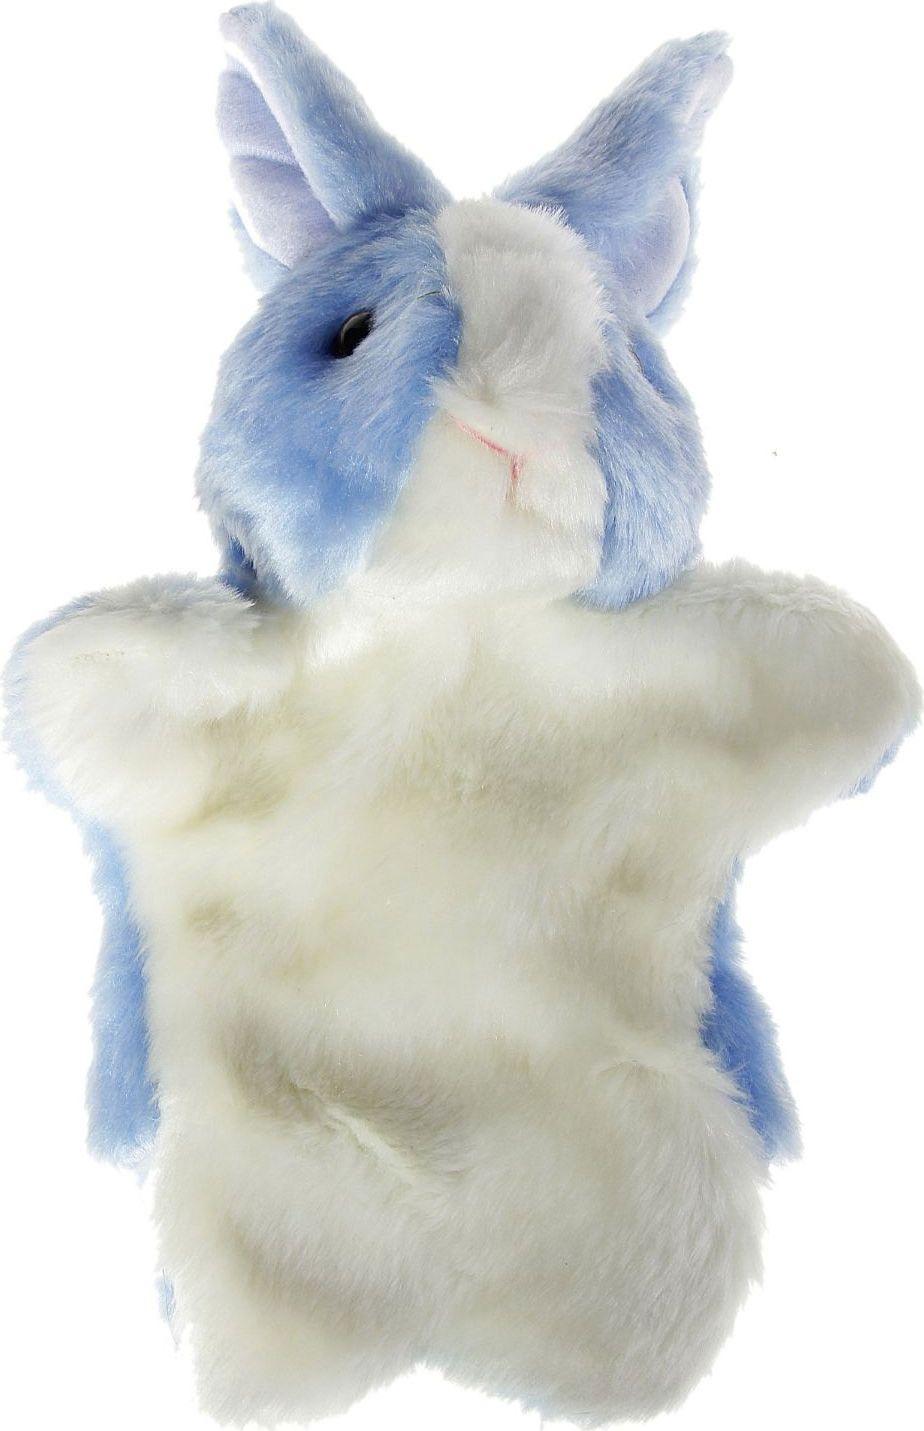 Sima-land Мягкая игрушка на руку Заяц цвет голубой, белый sima land антистрессовая игрушка заяц ушастик